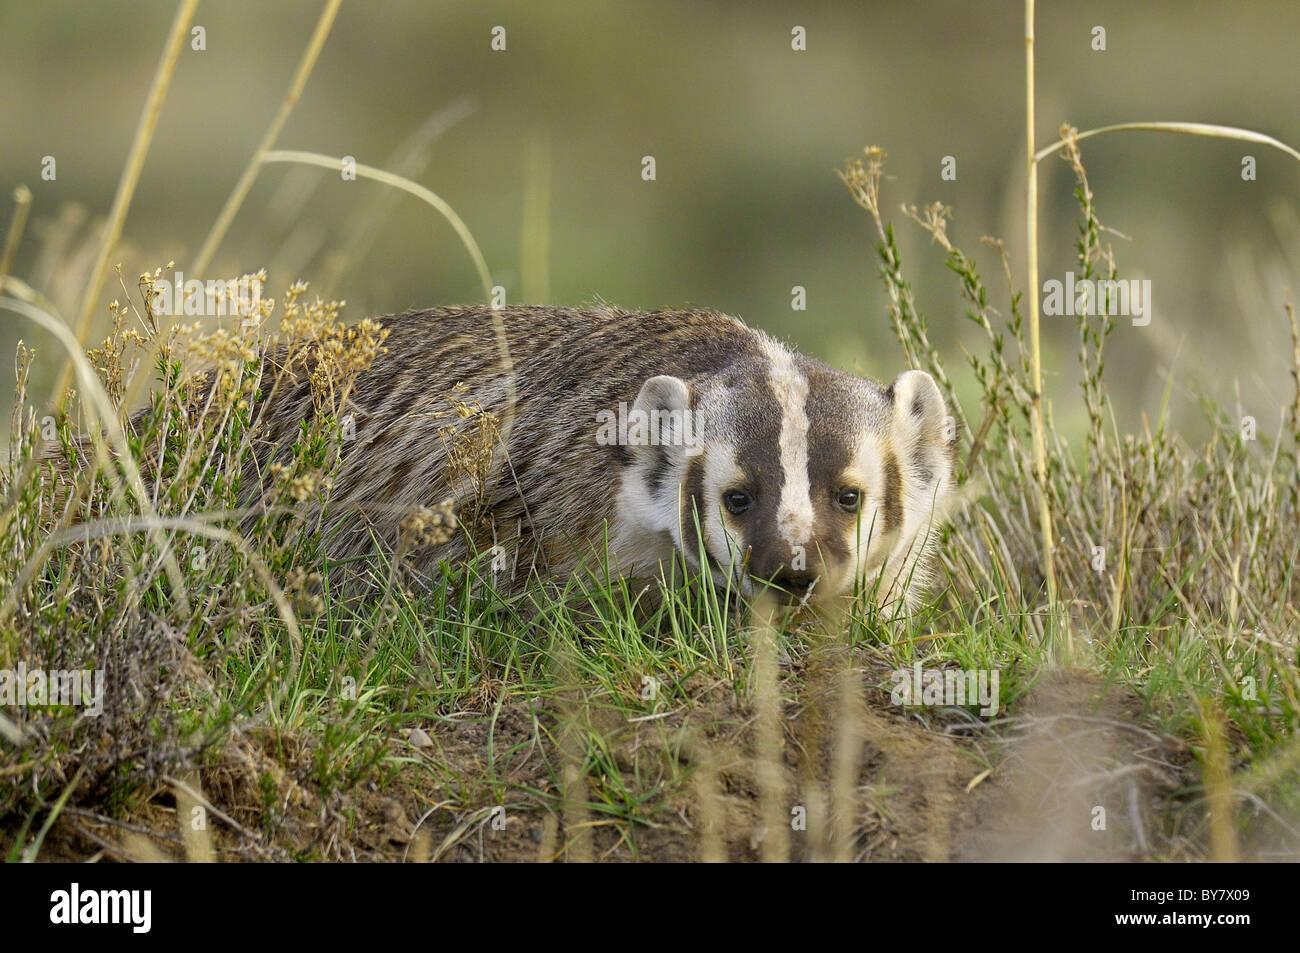 Badger hunting. Stock Photo